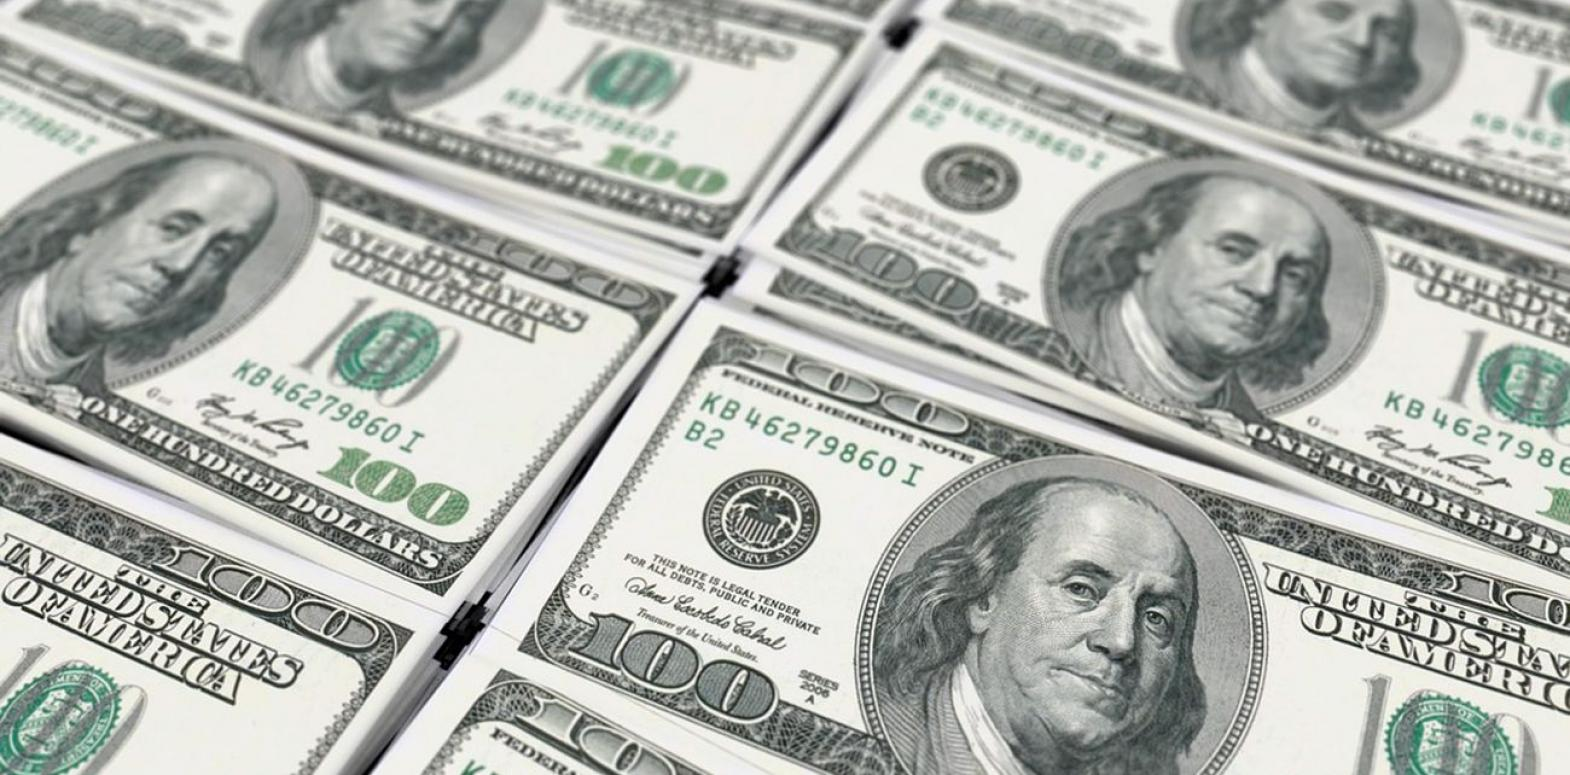 Доллар подорожал еще на 15 копеек. НБУ установил курс на 18 июня